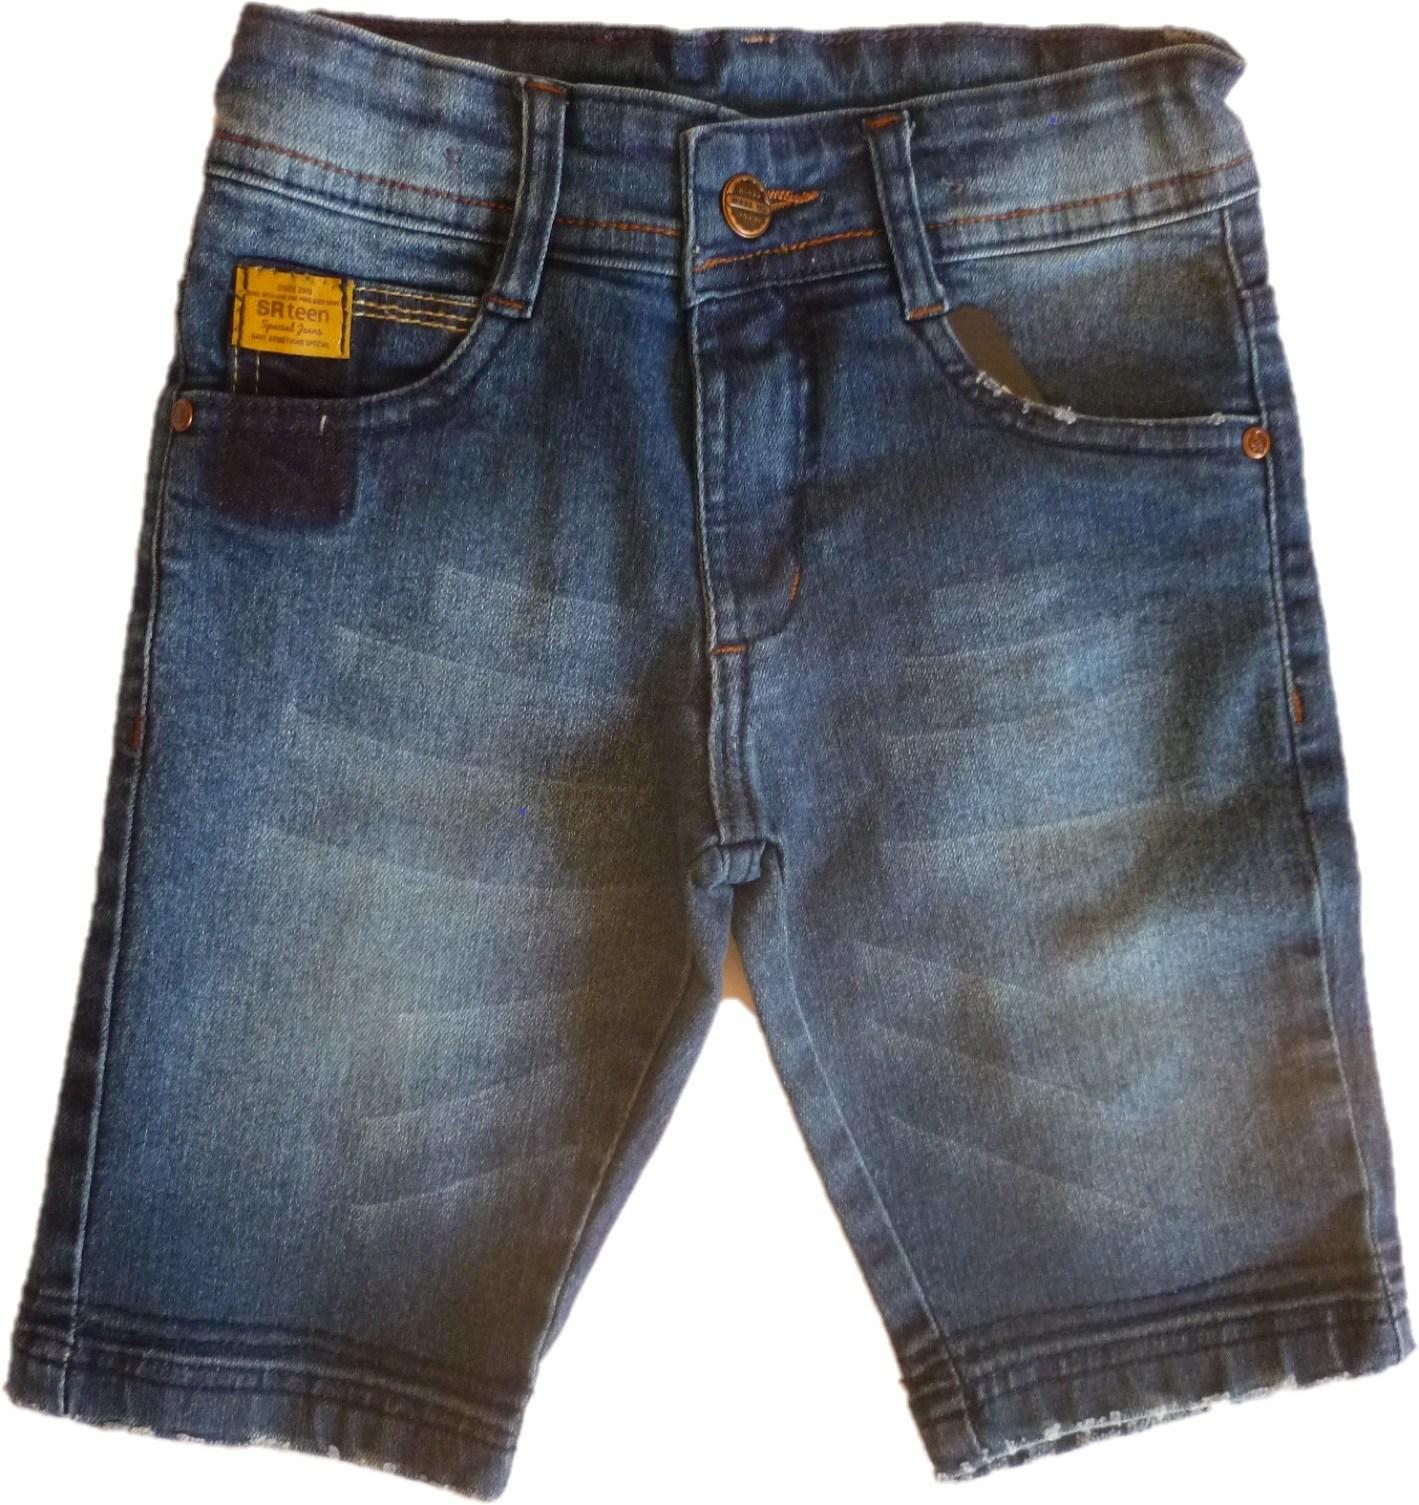 Bermuda Masculina Jeans Infantil [405]